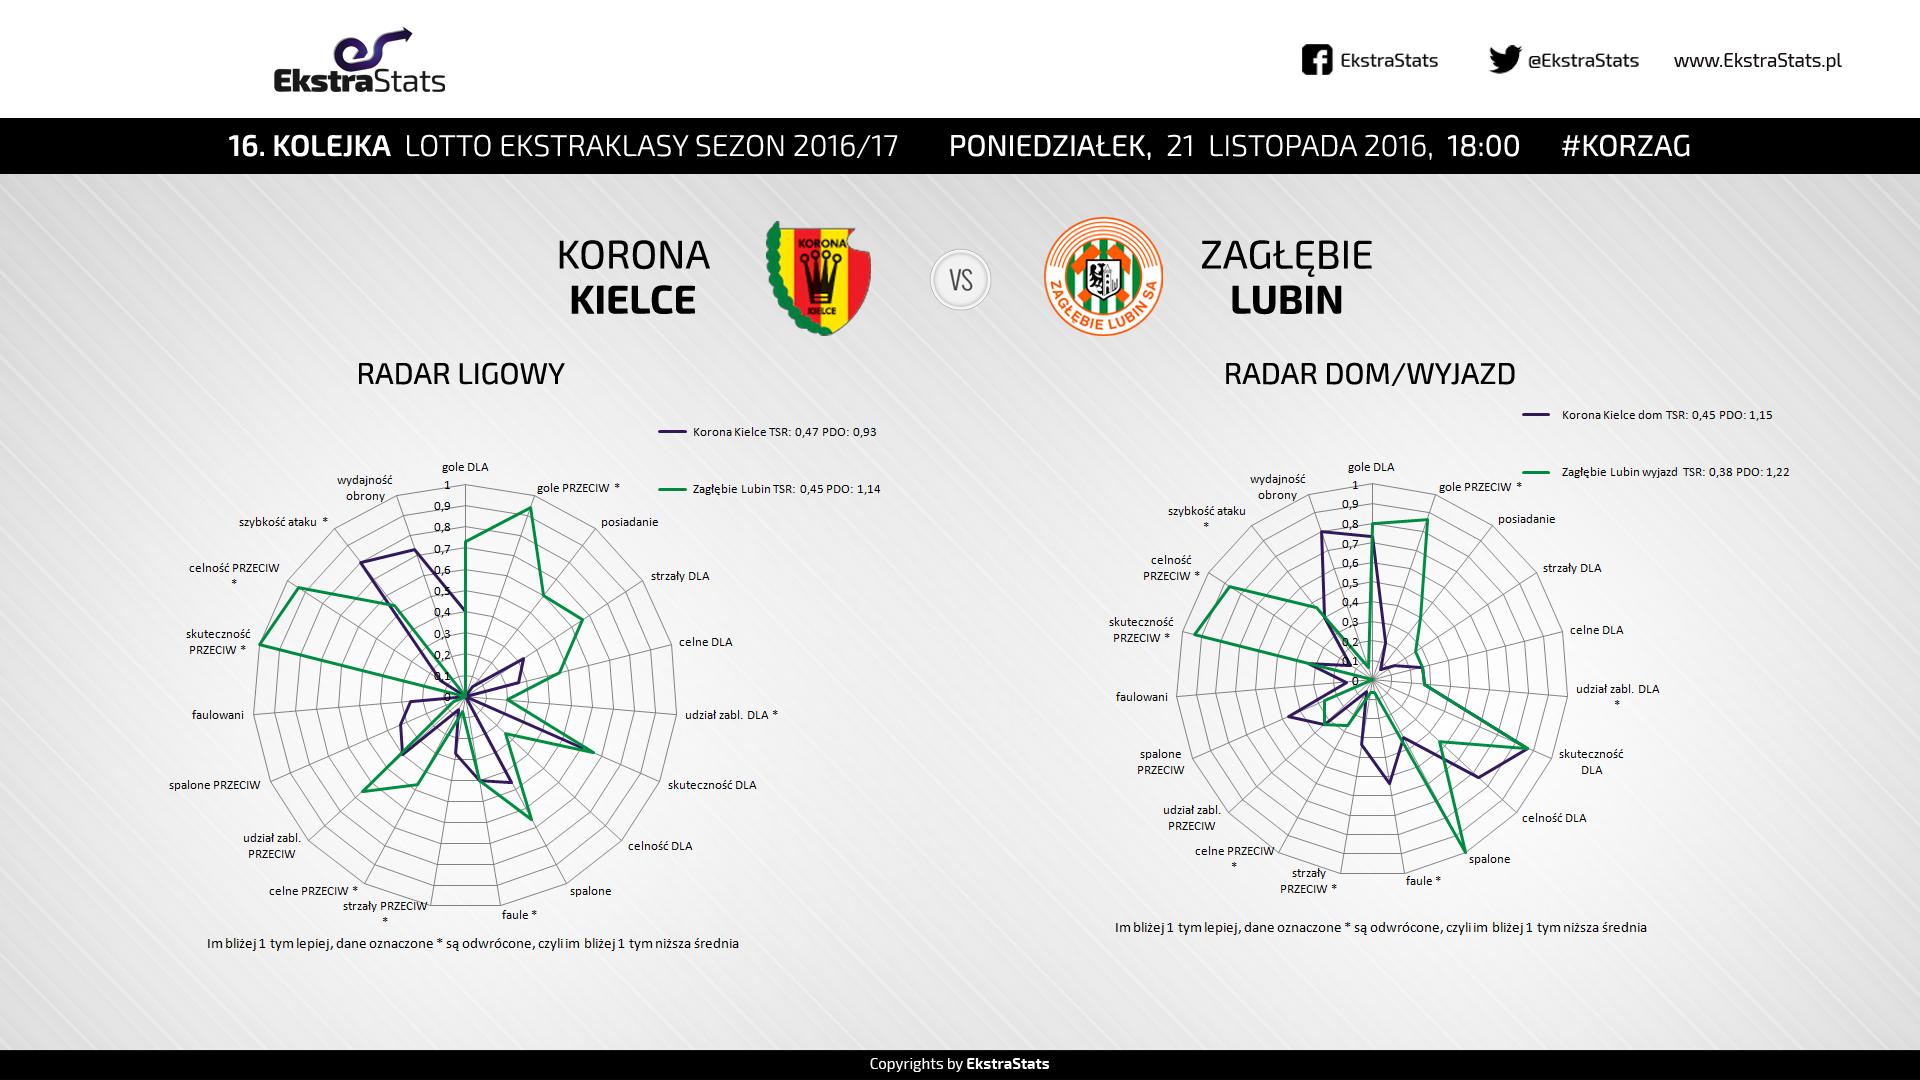 1617_16_korzag_radar